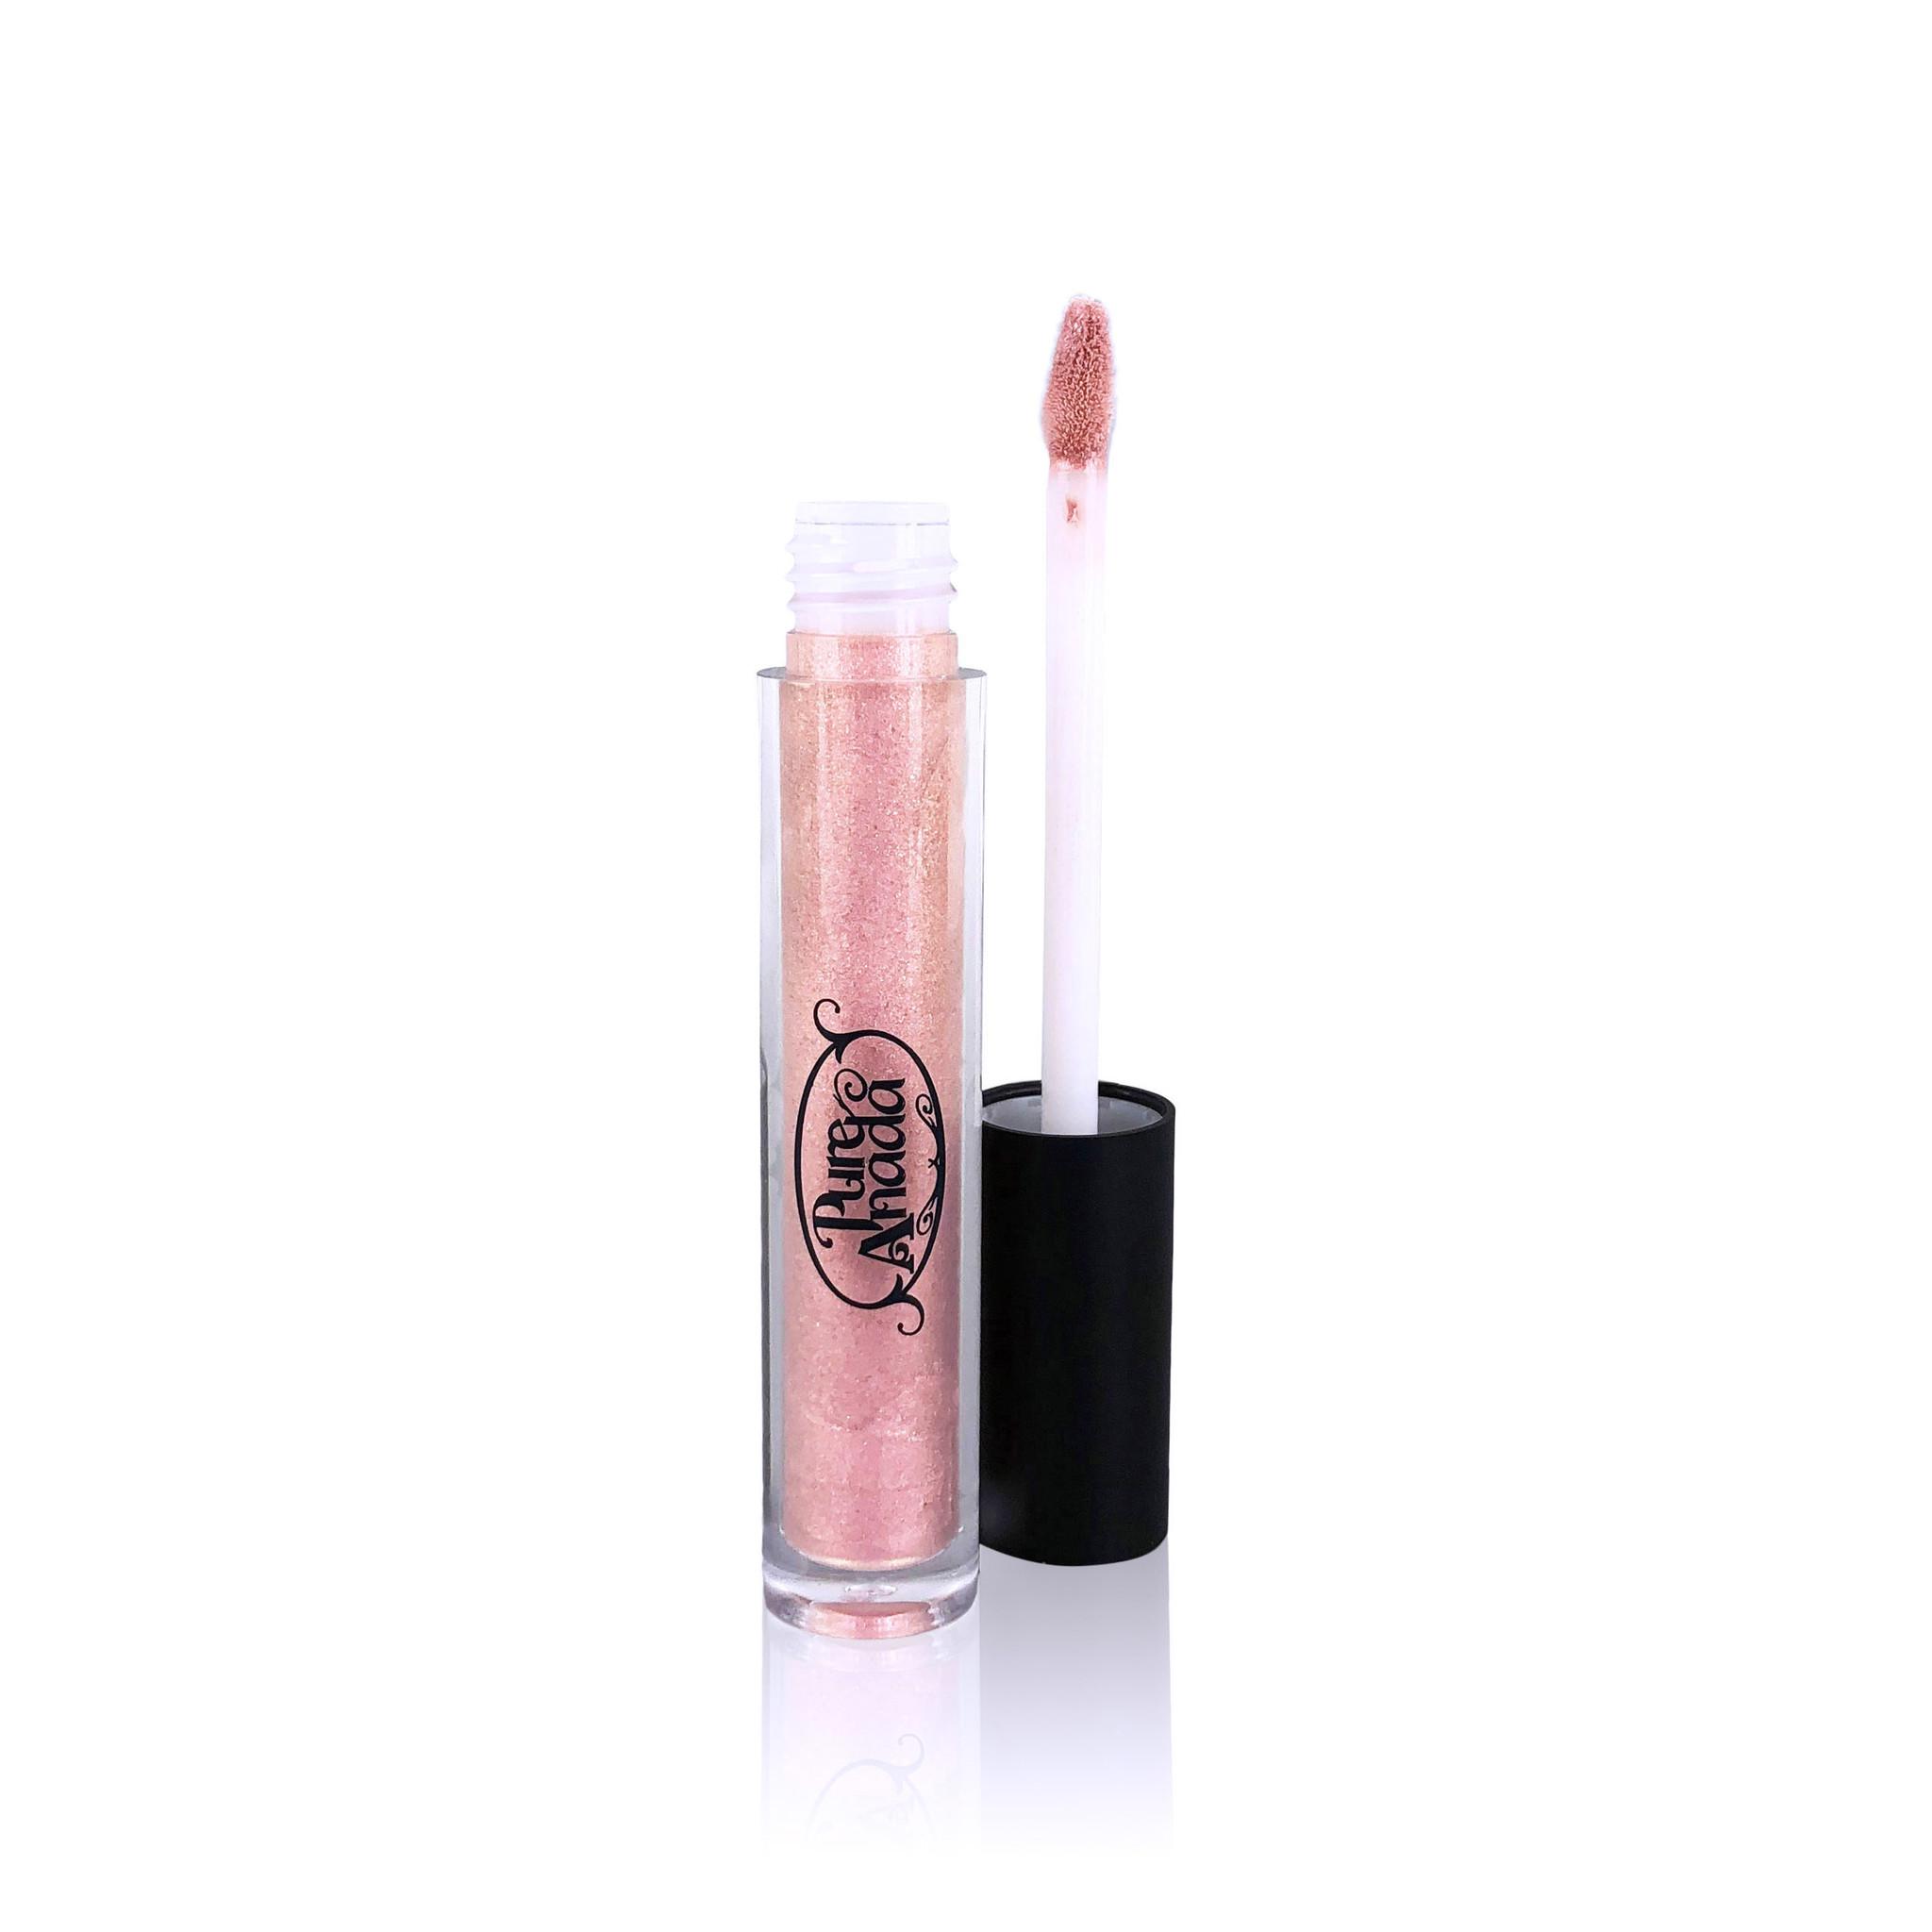 Glisten Mineral Lip Gloss - Opal-2